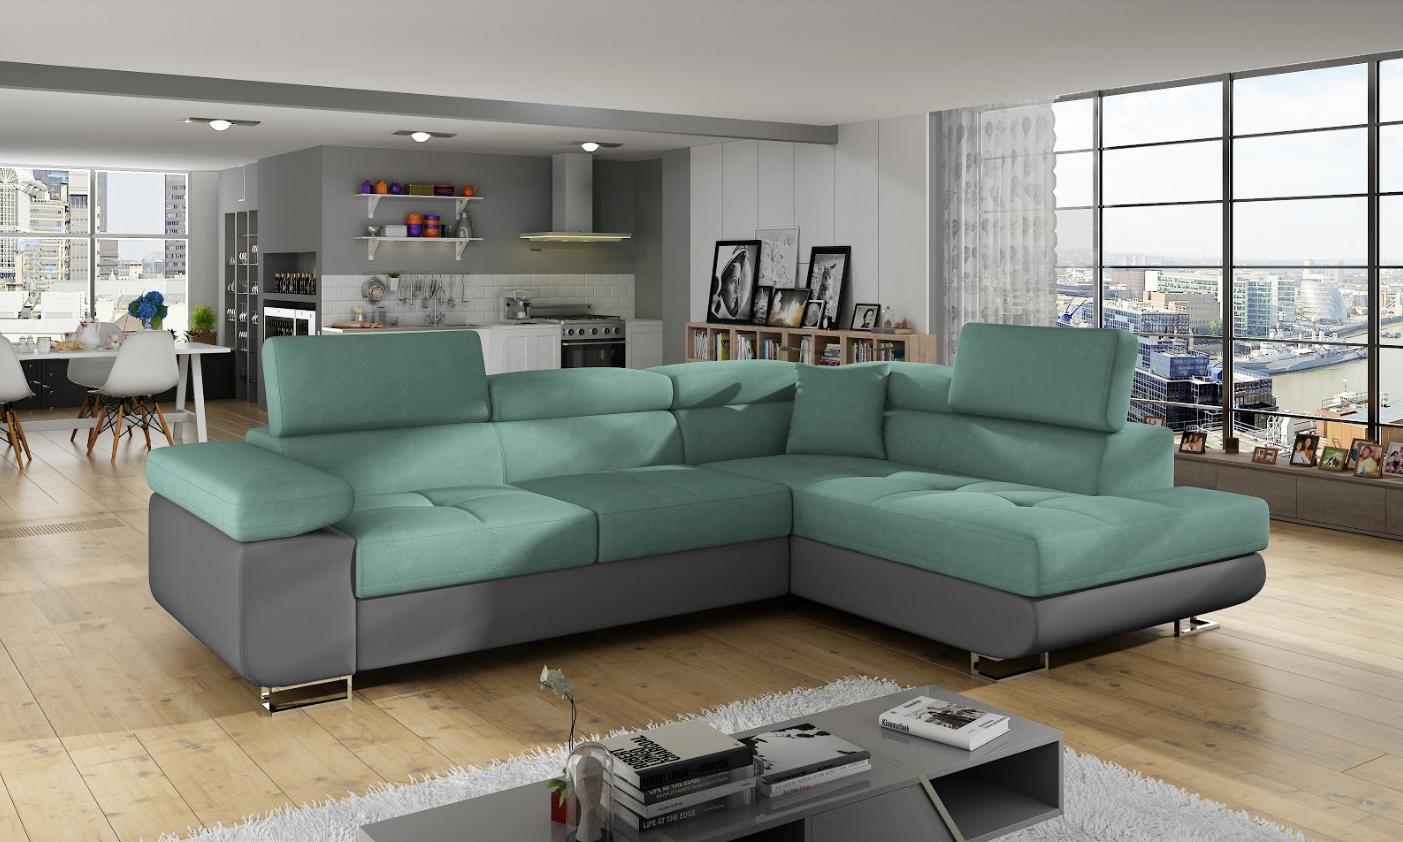 Bettfunktion sofa couch ecksofa eckcouch polster ecke for Ecksofa textil